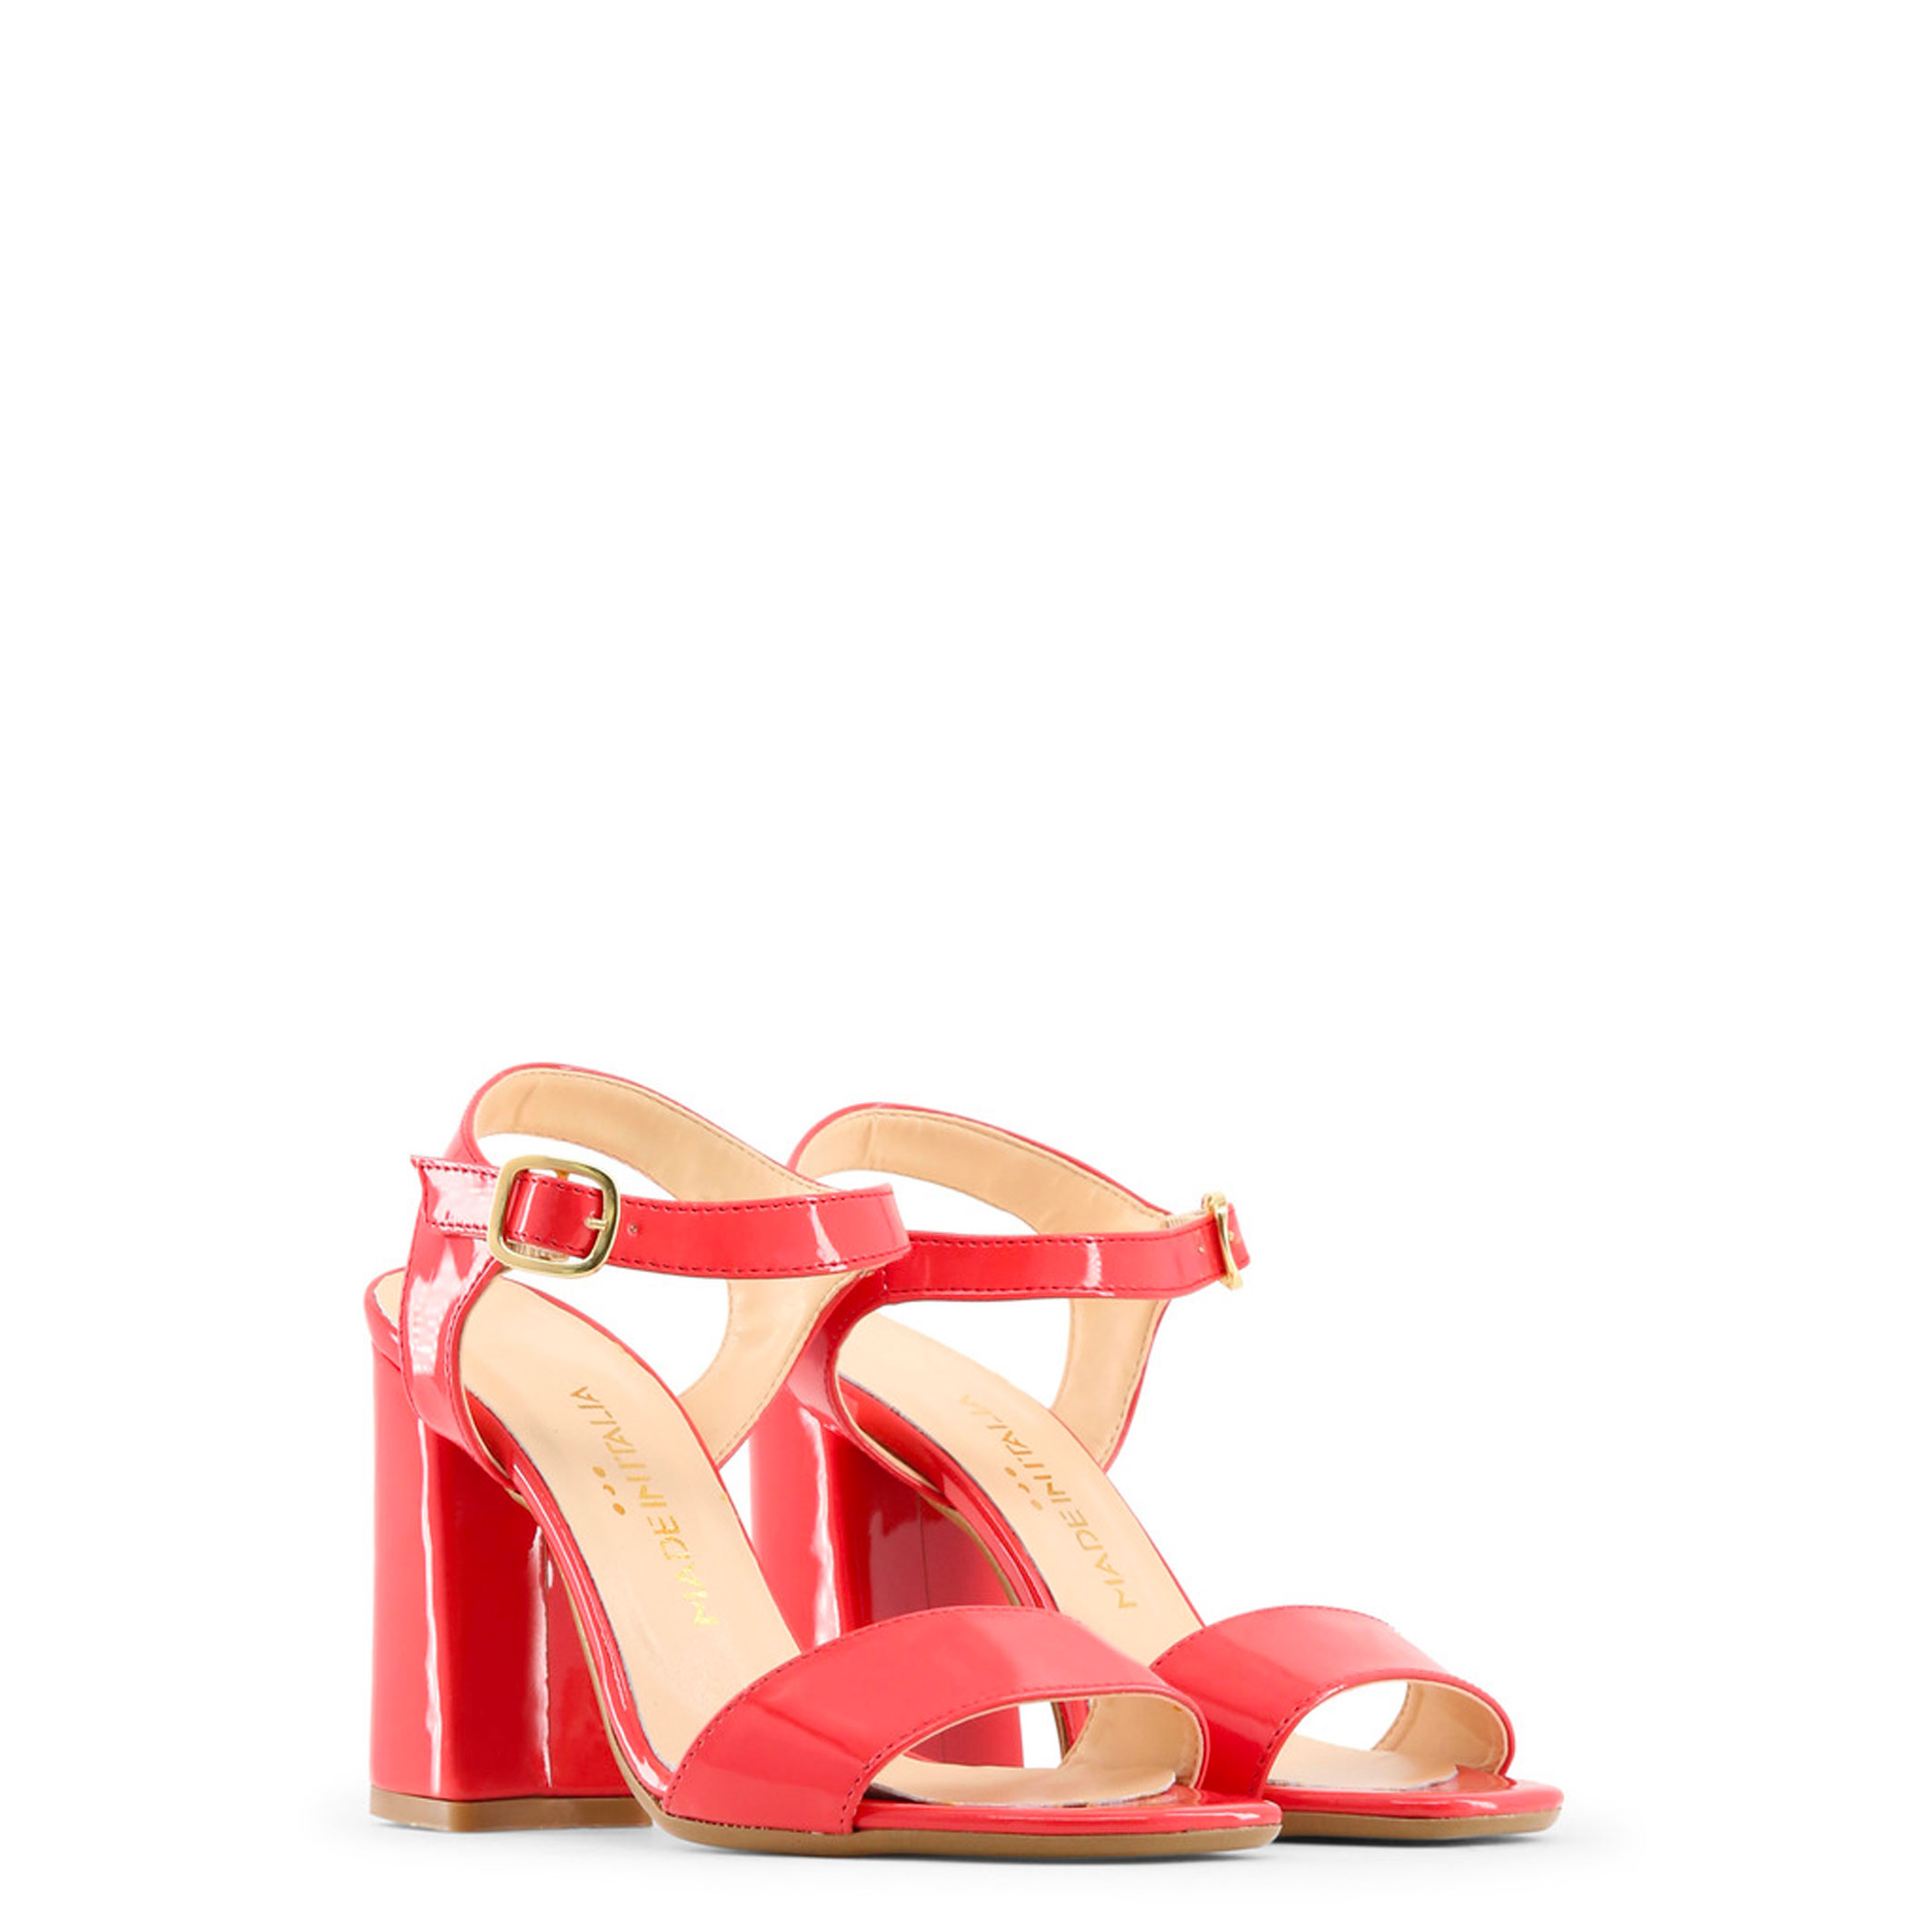 Schuhe ANGELA, ANGELA, Schuhe Damen Sandalette Schwarz/Gelb/Rot Keilabsatz f02e89